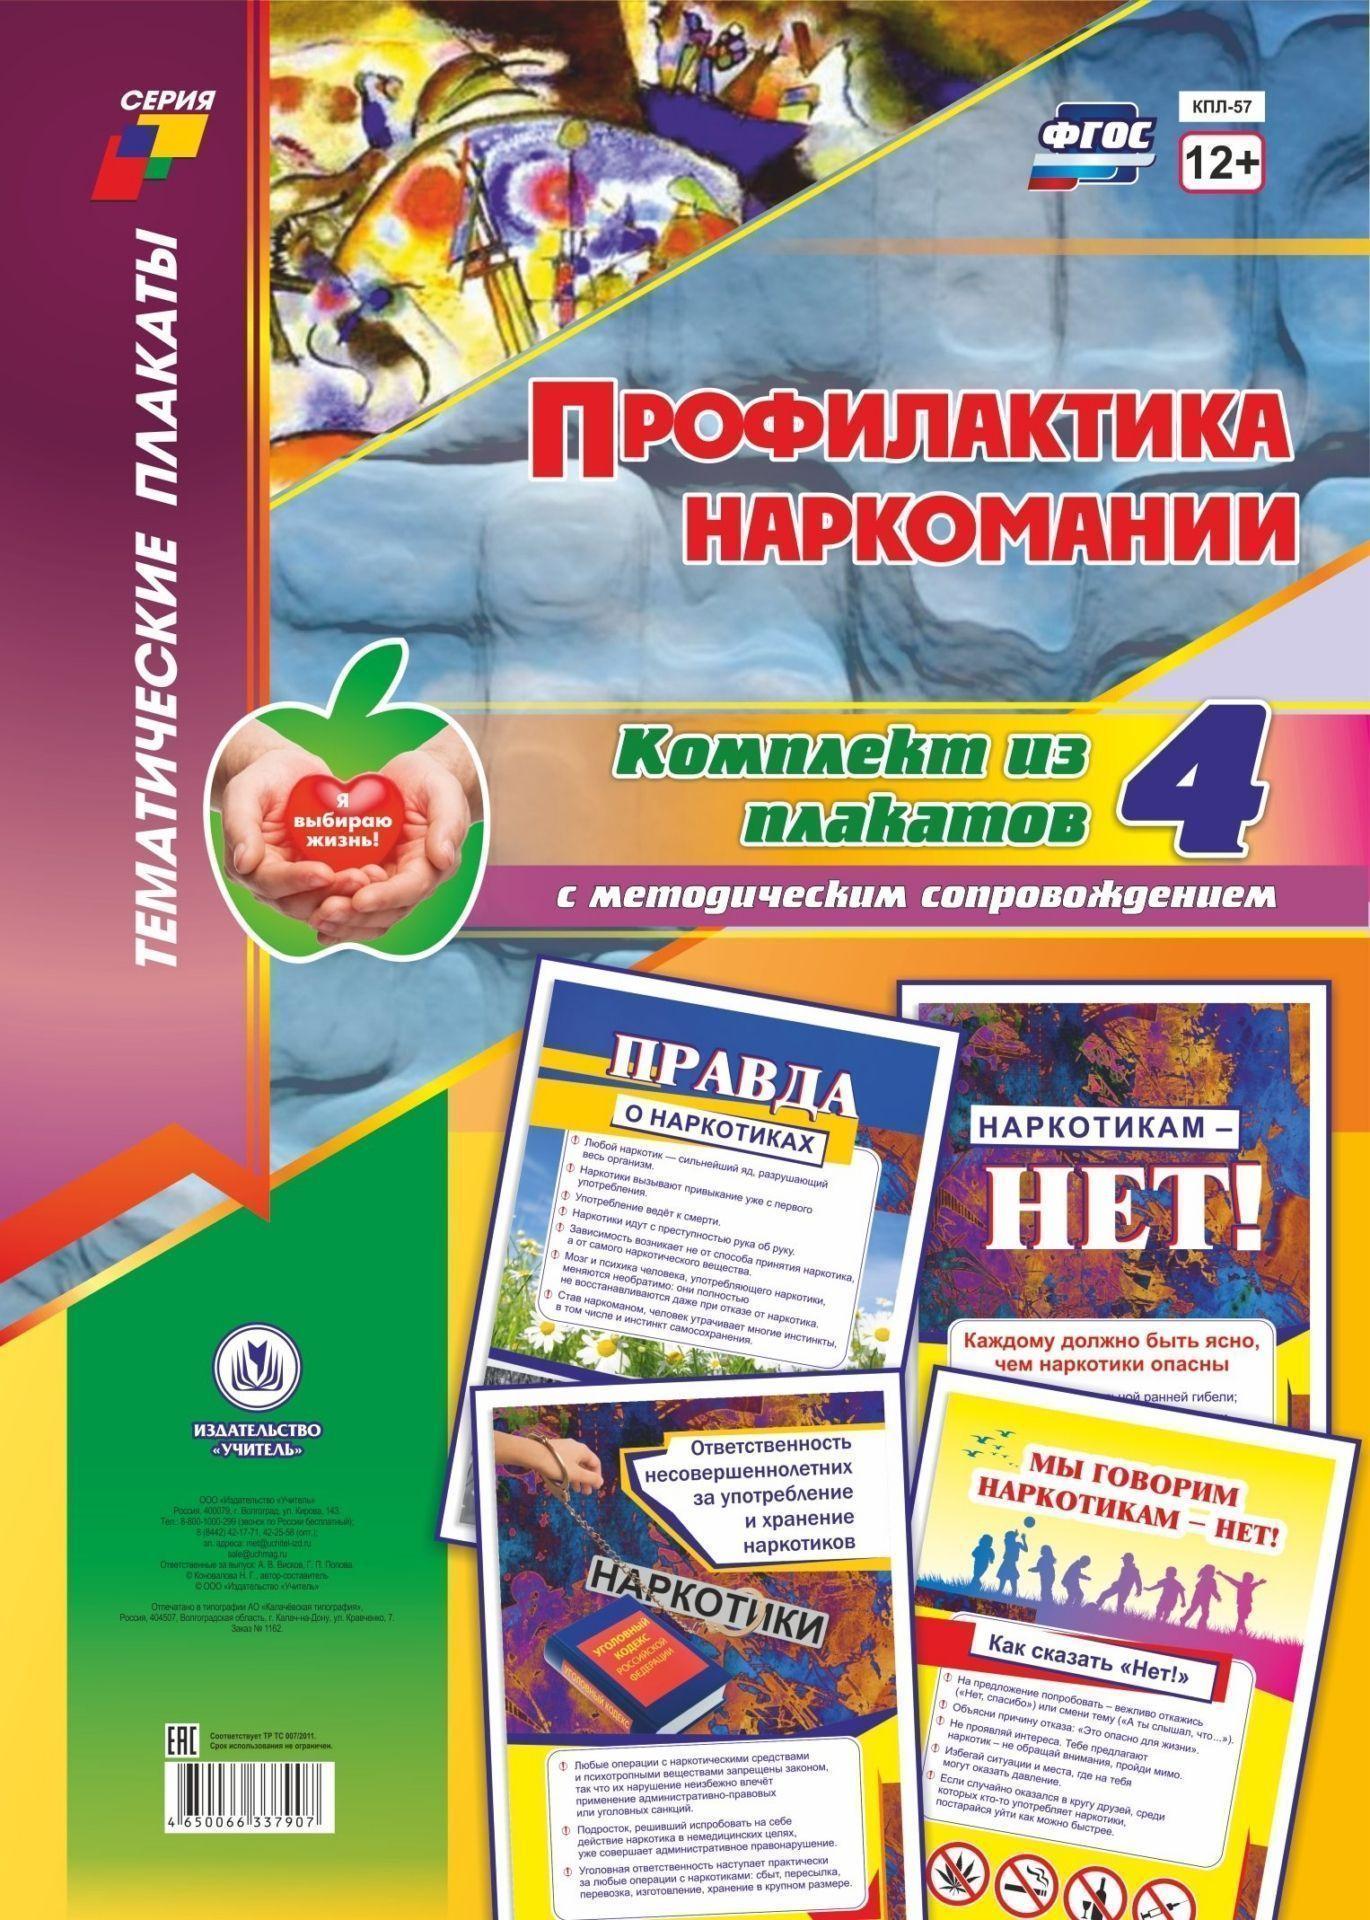 "Фото #1: Комплект плакатов ""Профилактика наркомании"": 4 плаката с методическим сопровождением"